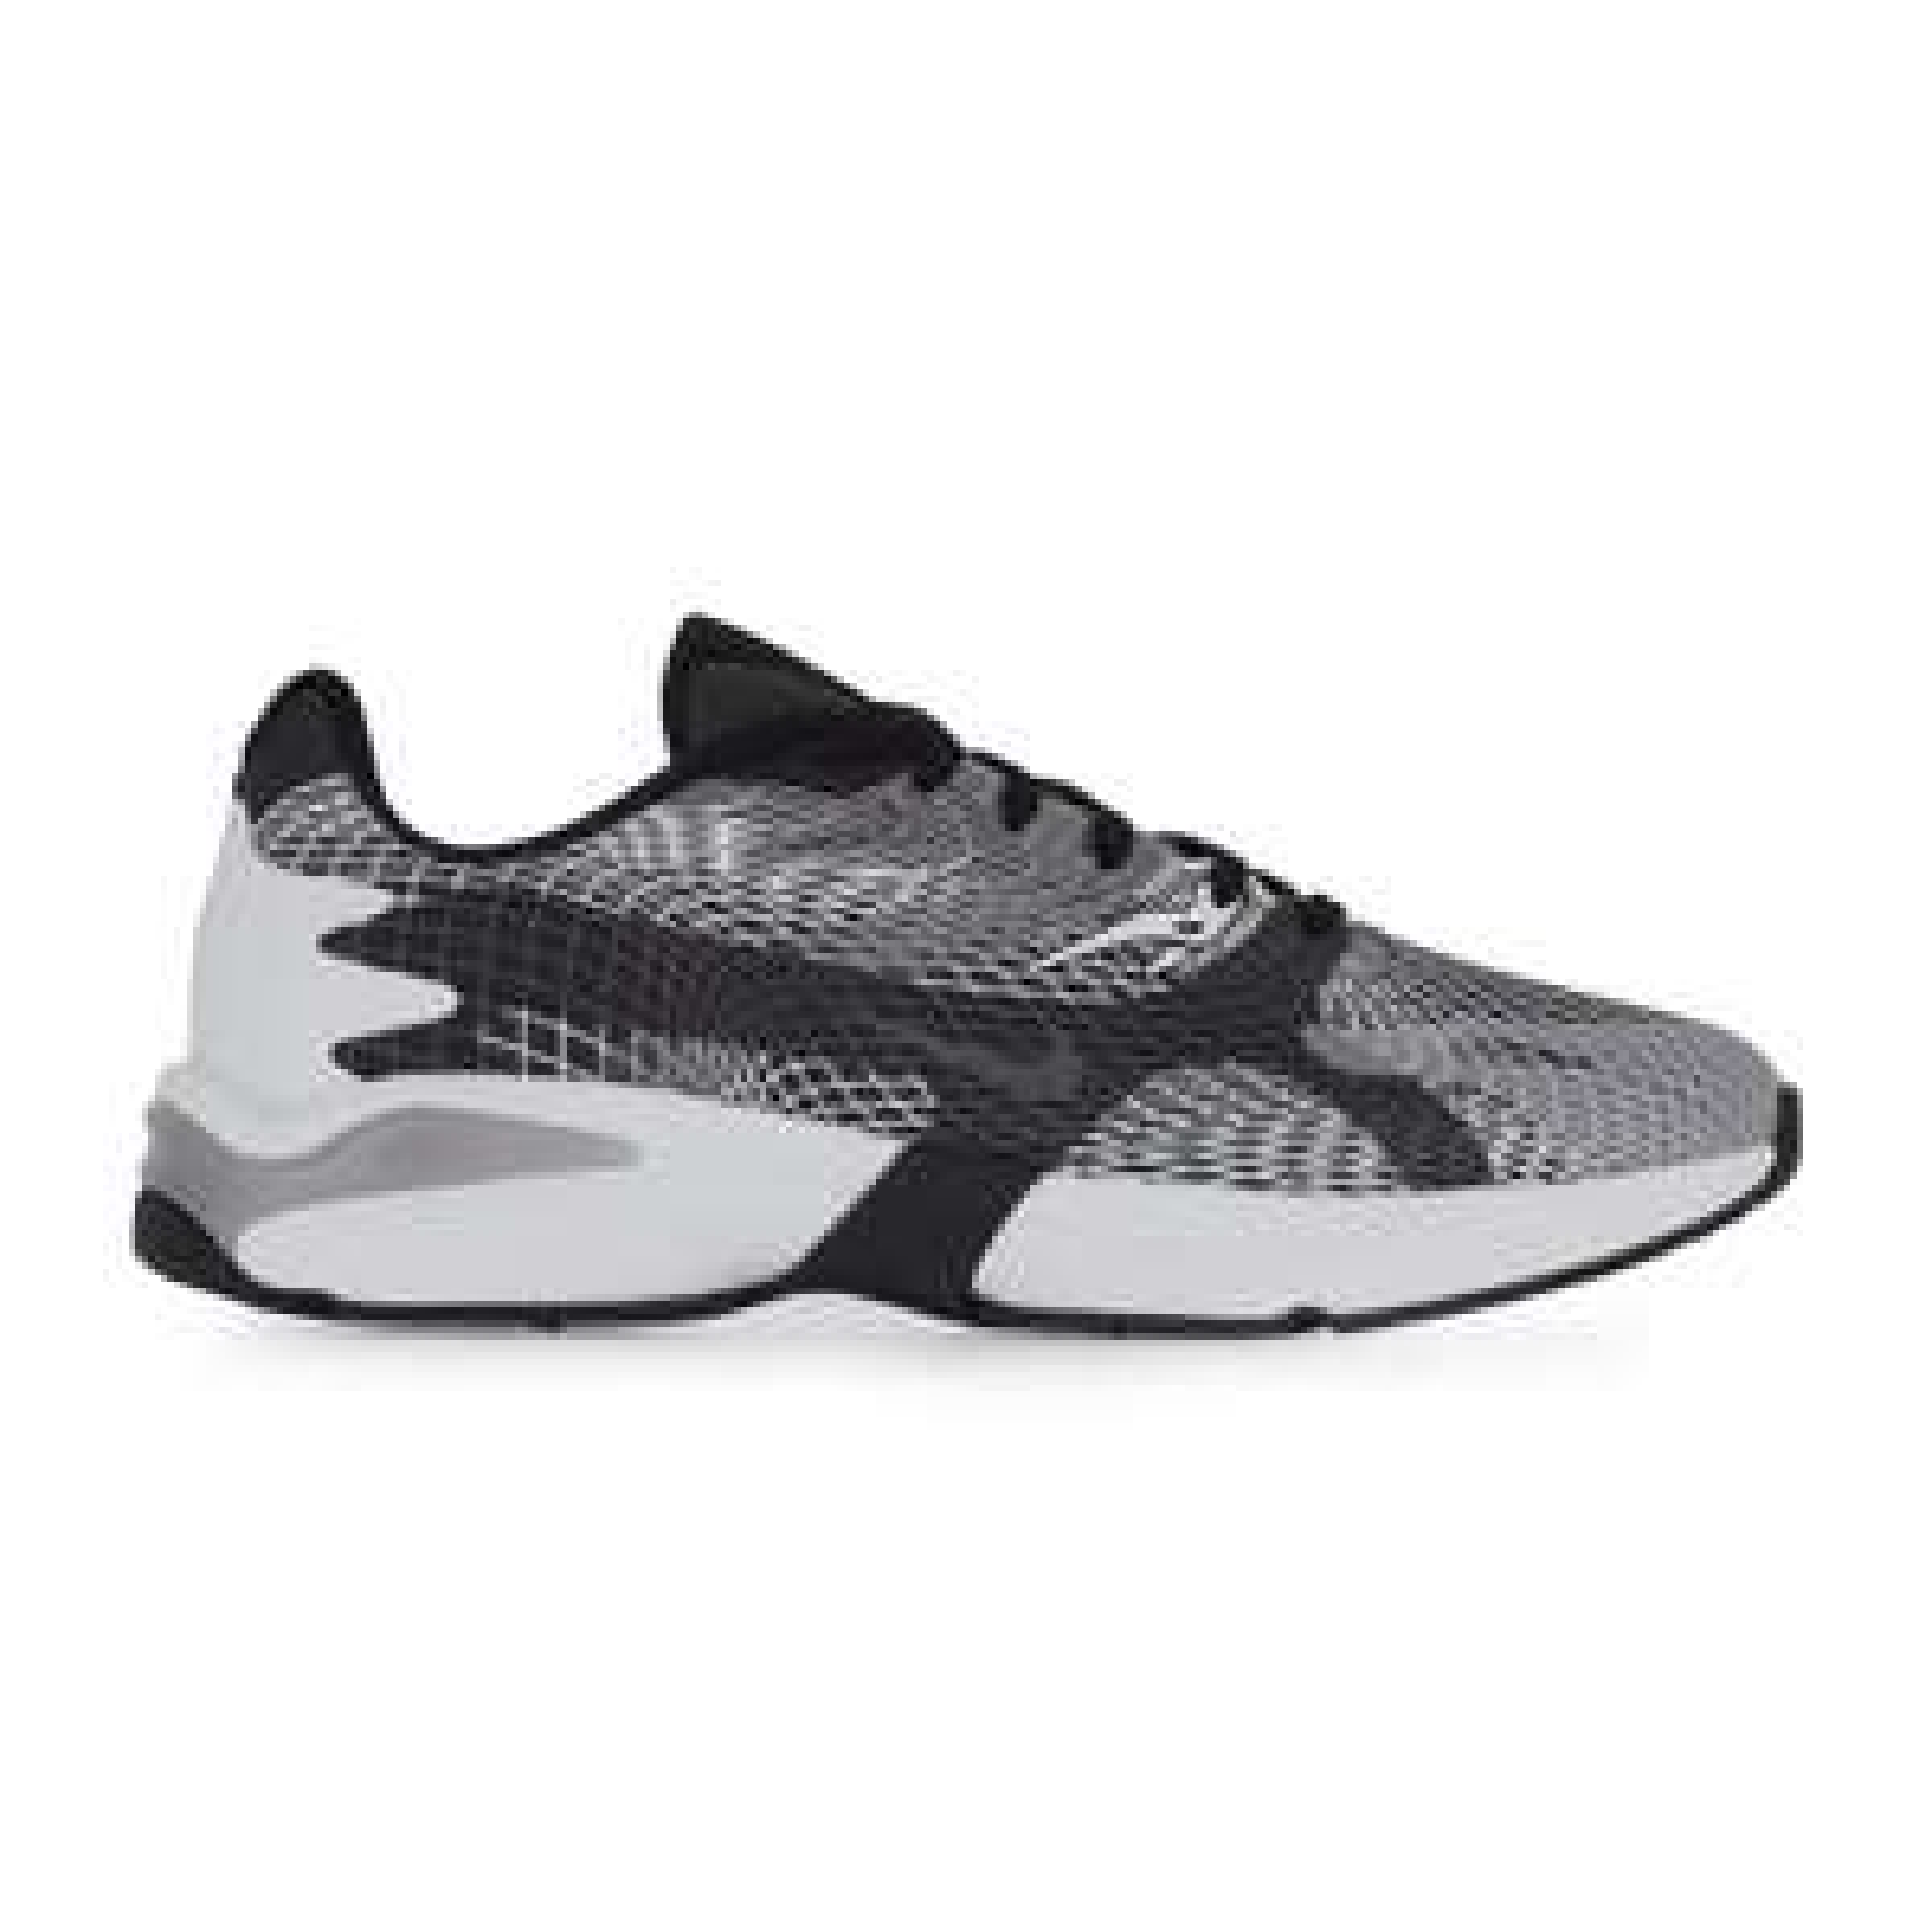 Baskets Homme Nike Ghoswift (Taille au choix) - Noir et blanc